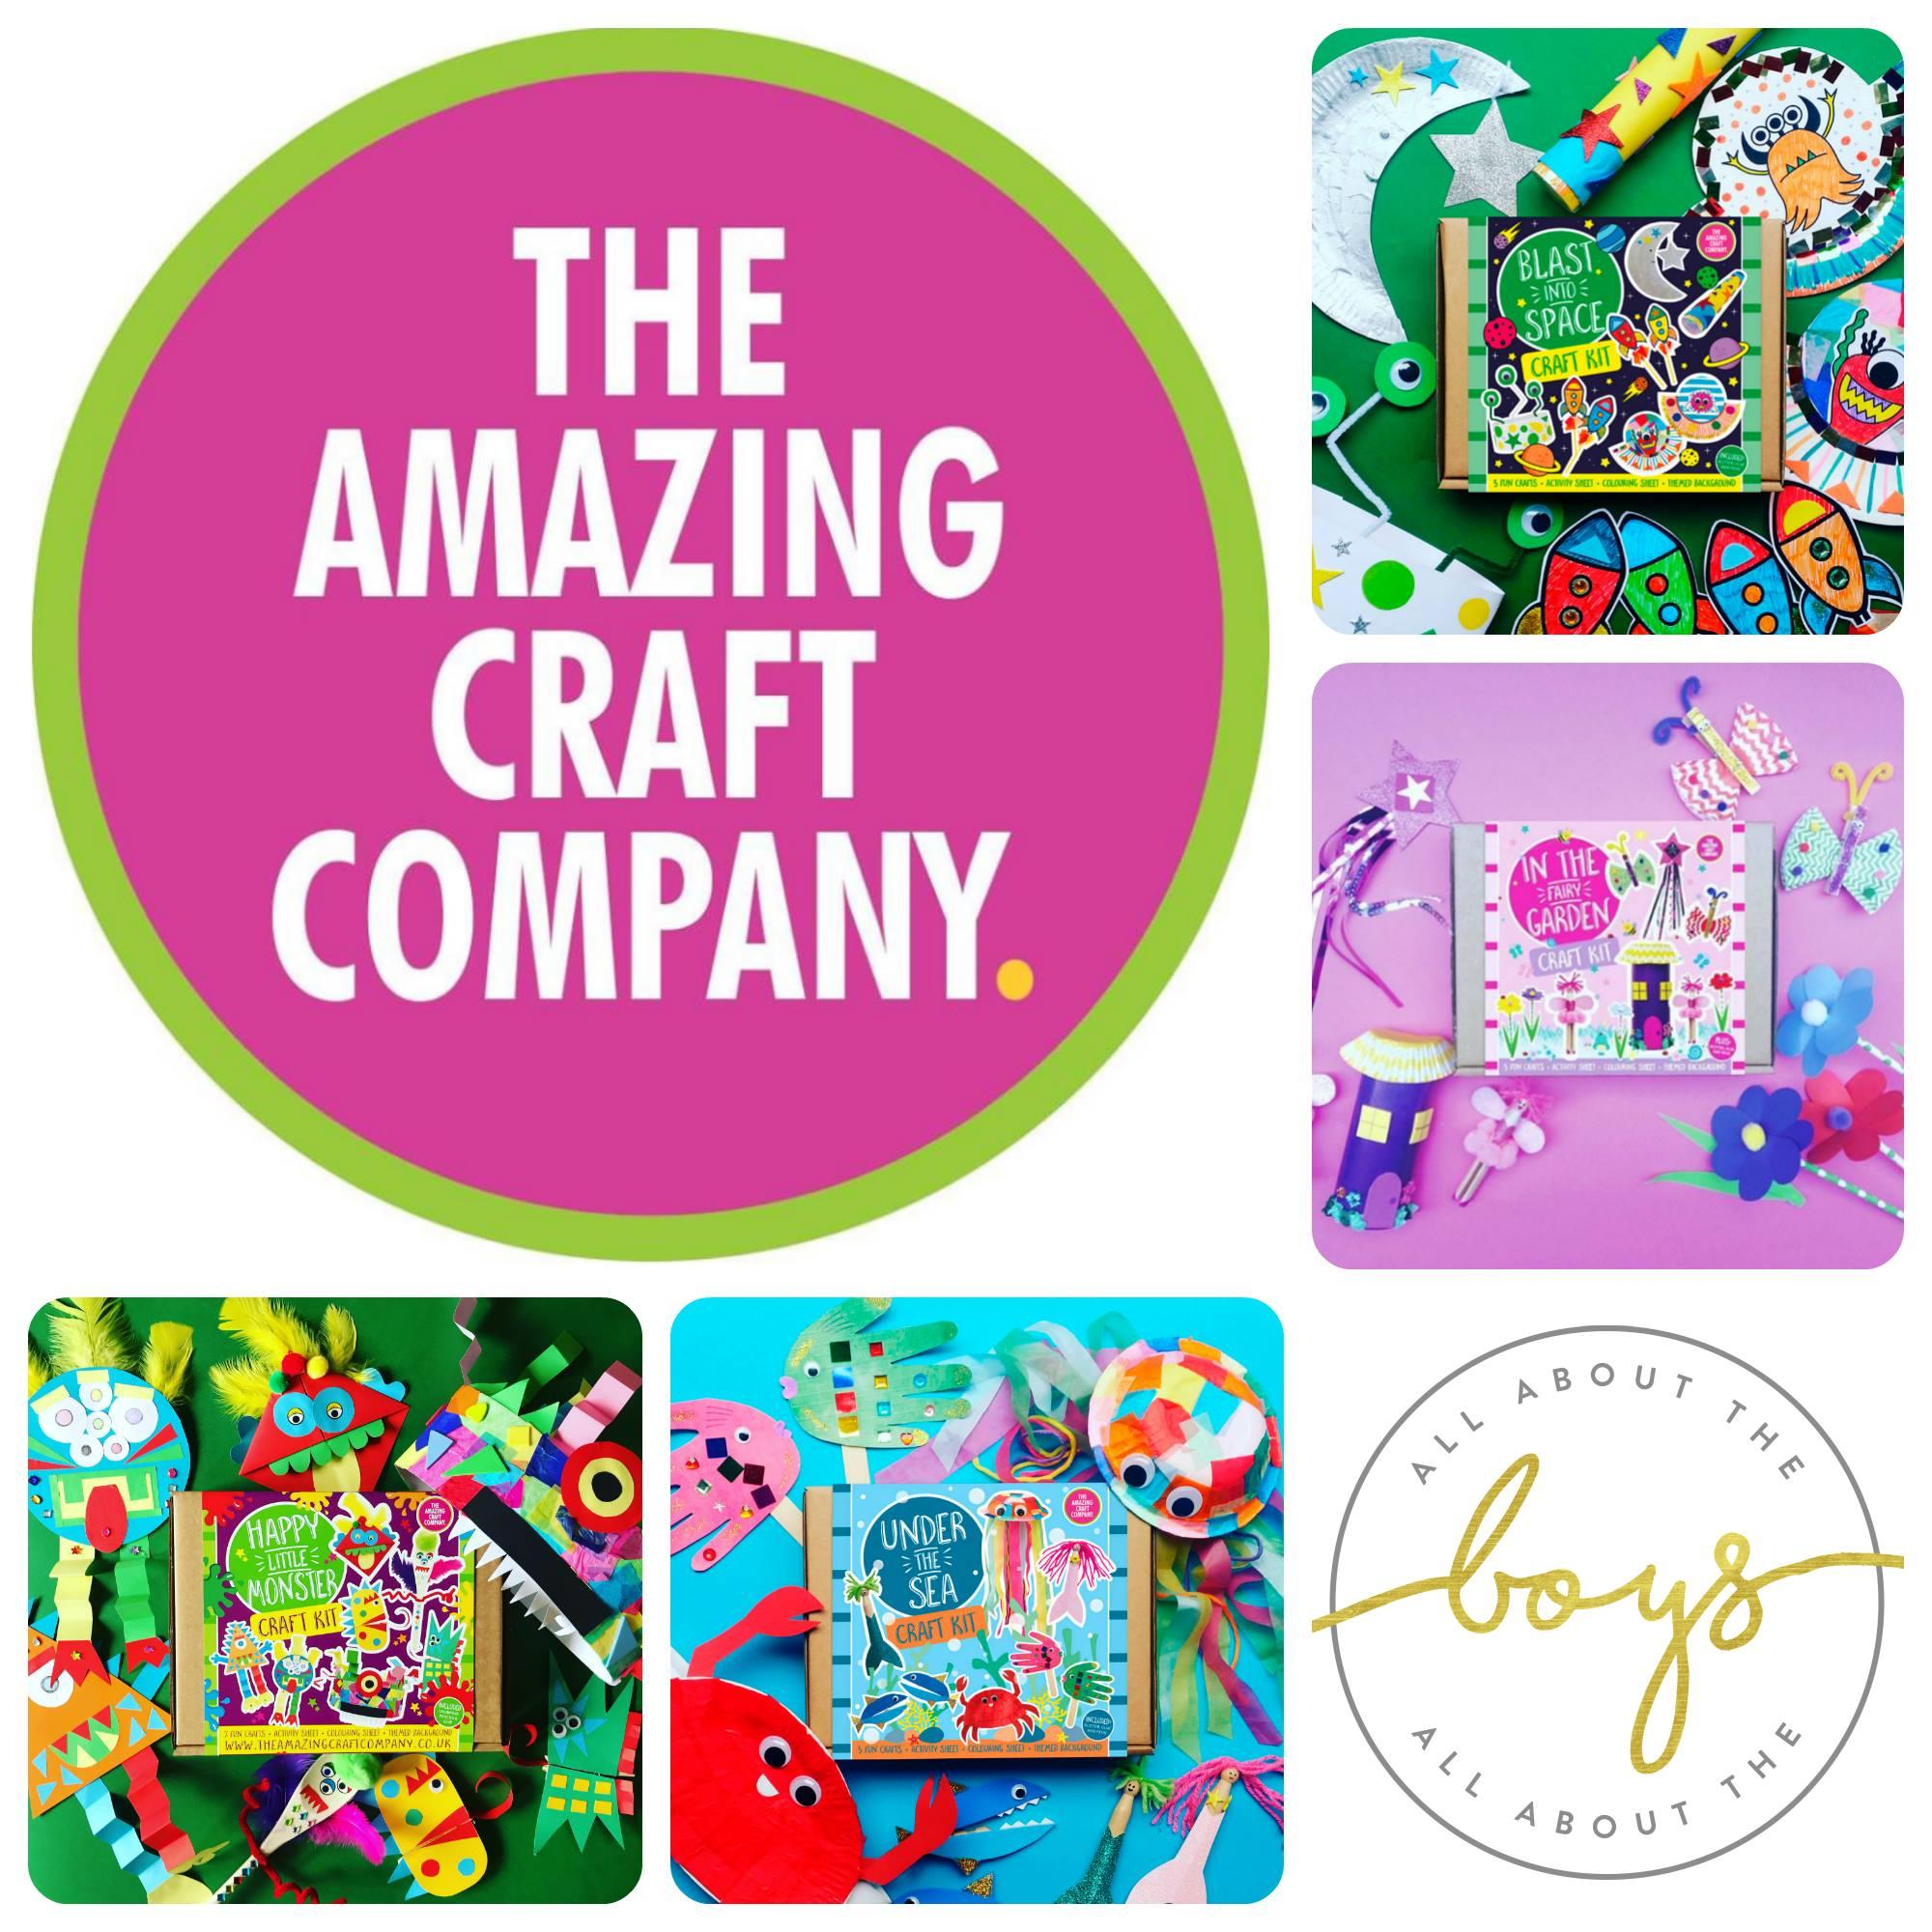 The Amazing Craft Company